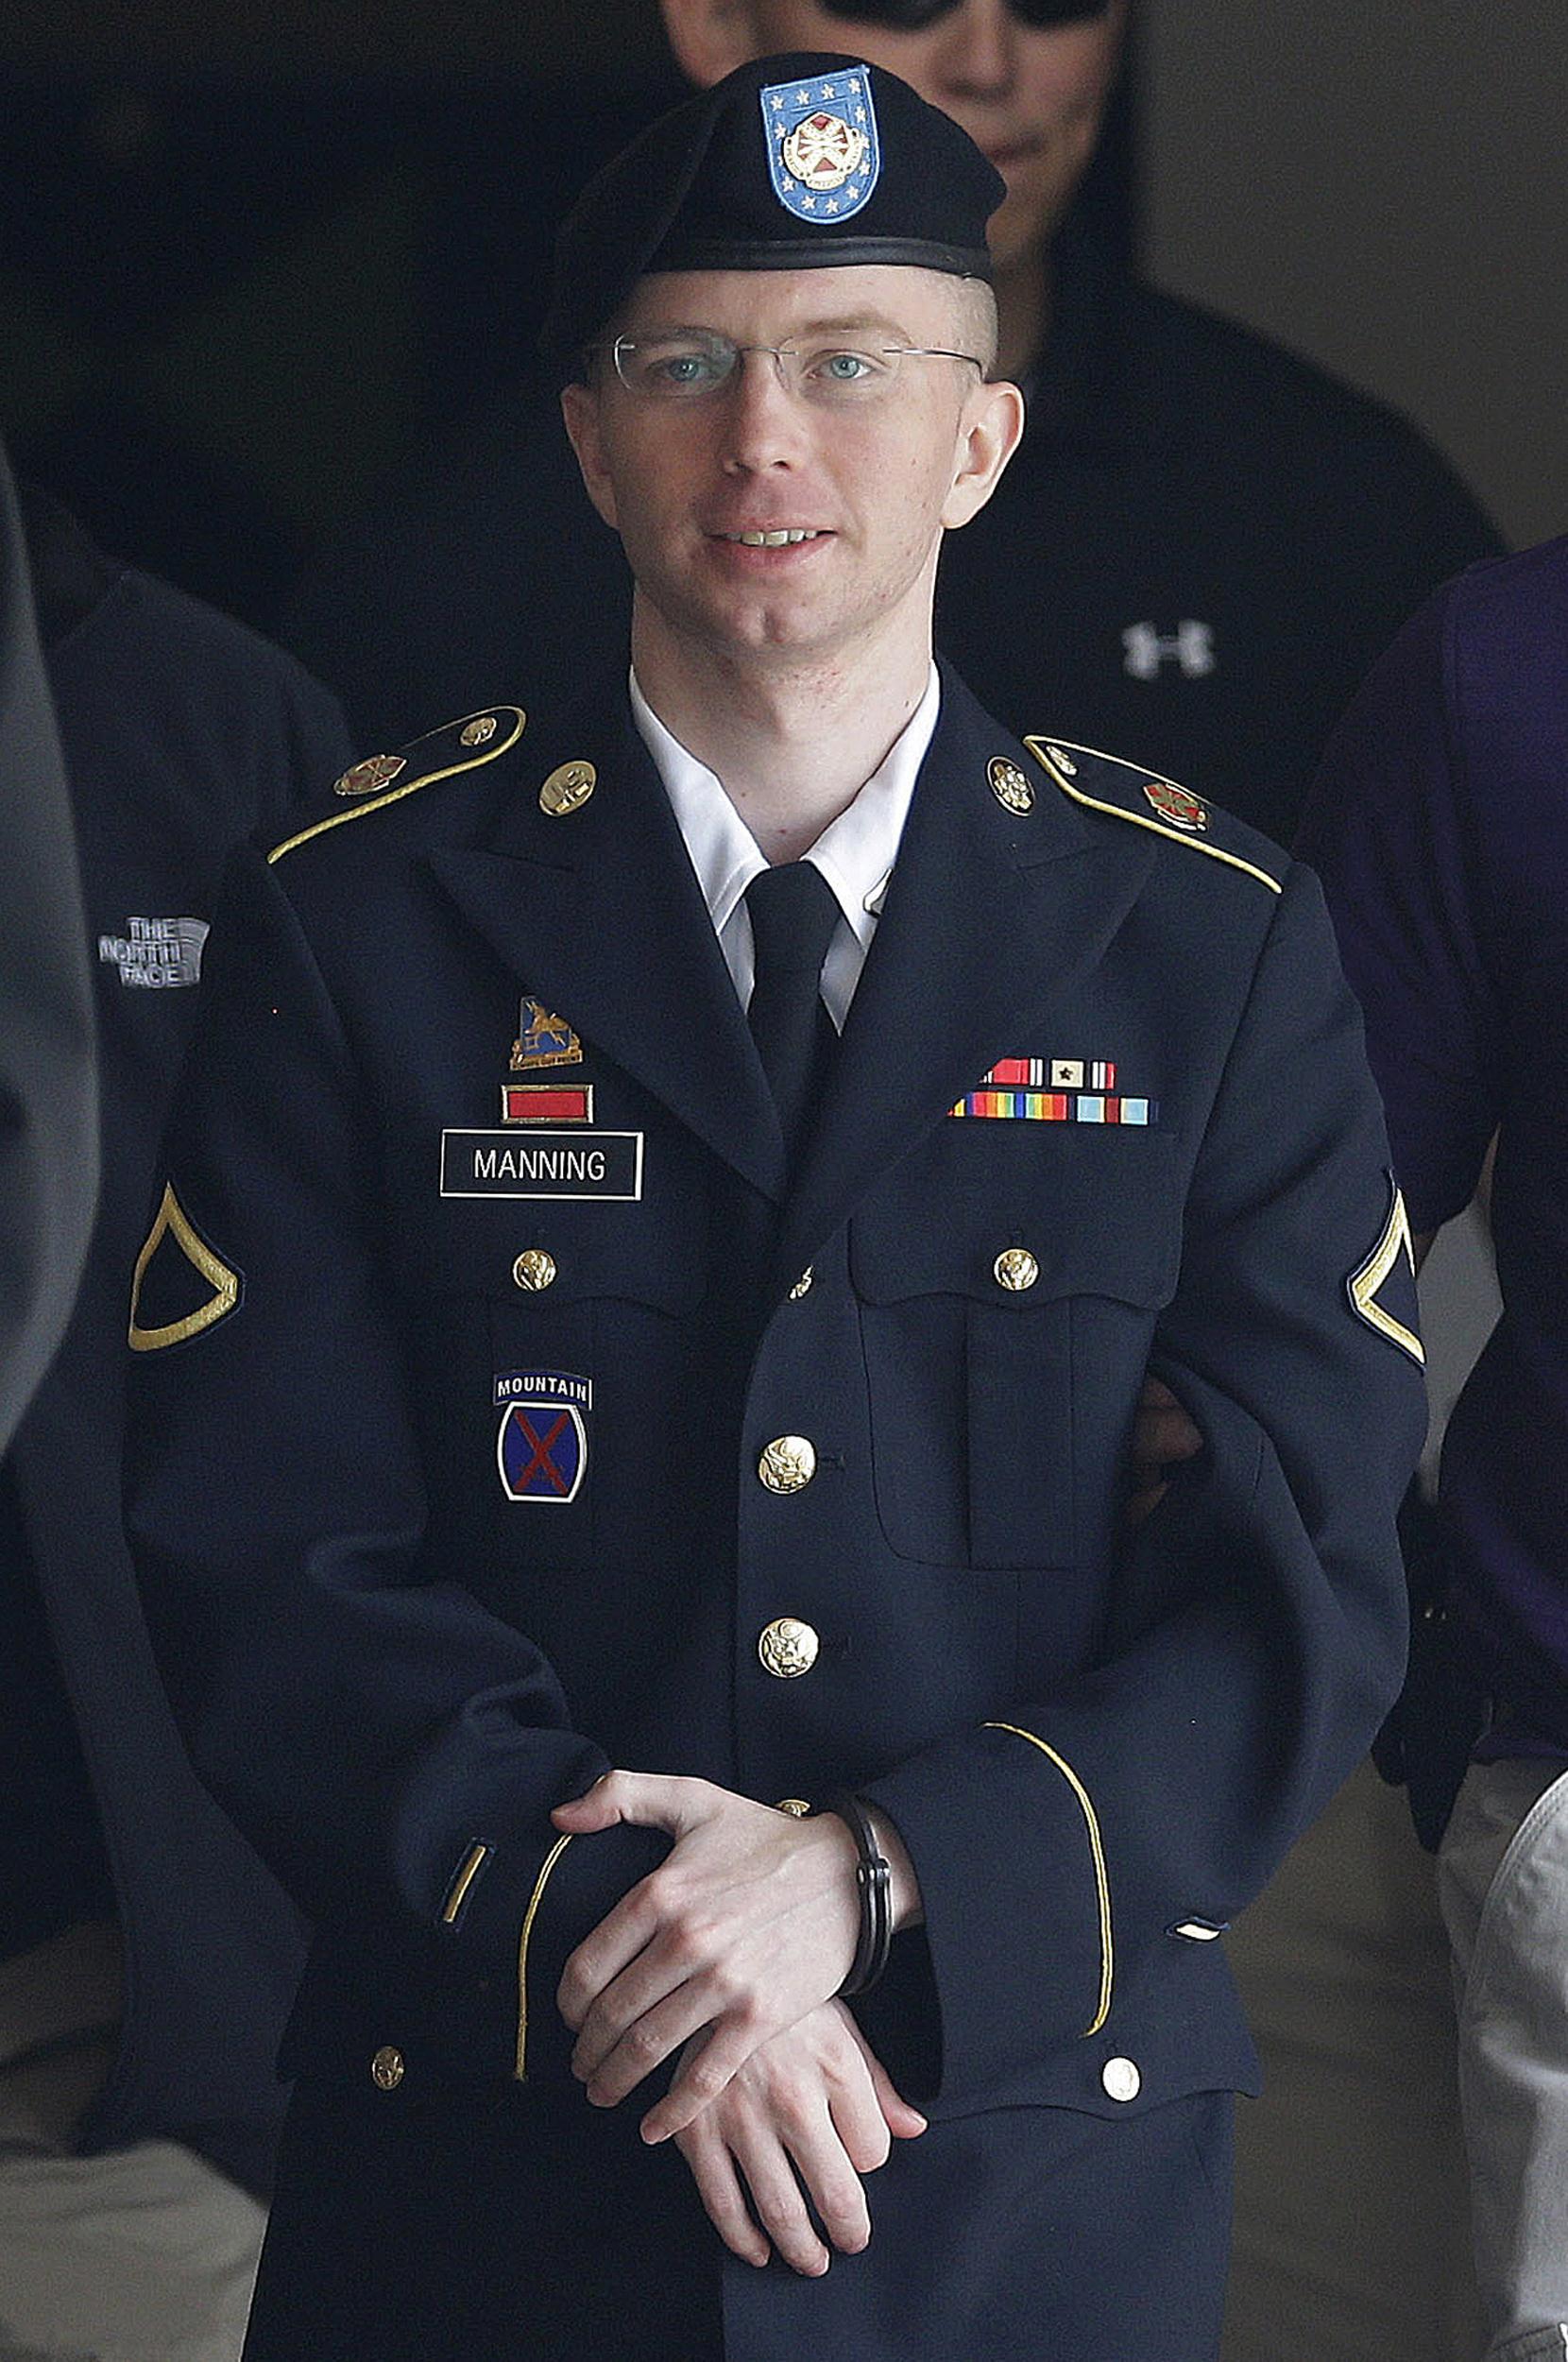 Image: Bradley Manning